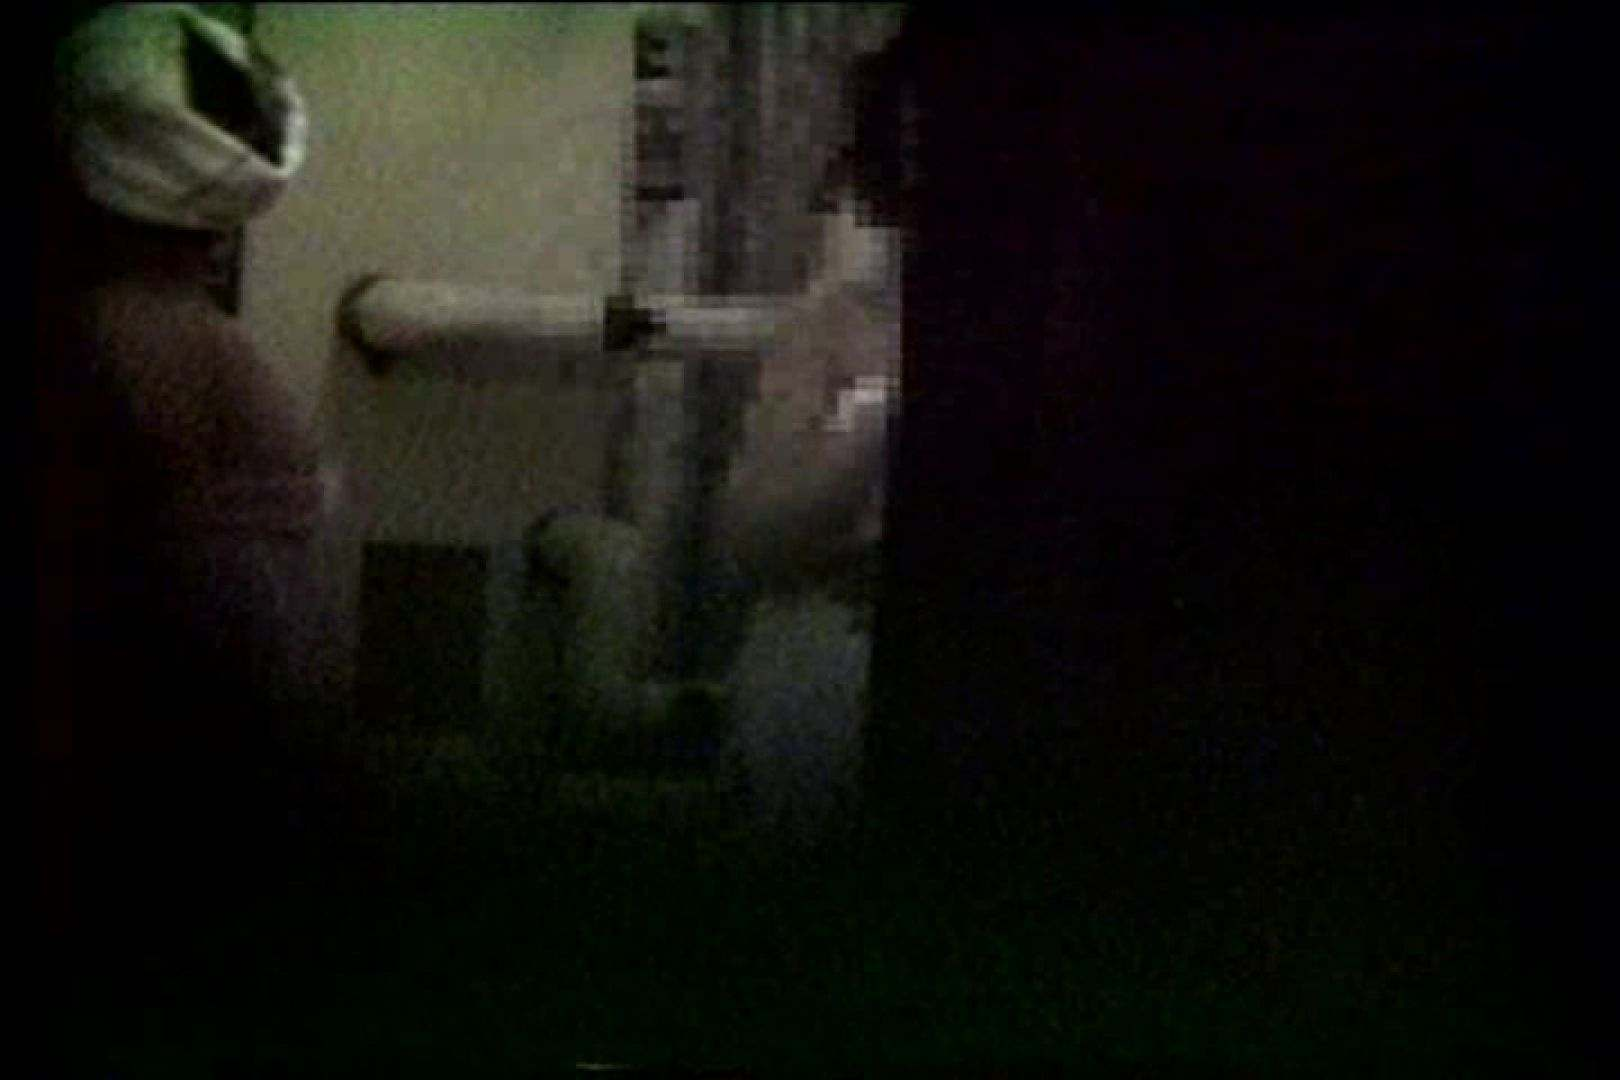 STY-018 仰天!どうして撮れたか? 前編 裸体 われめAV動画紹介 107pic 80